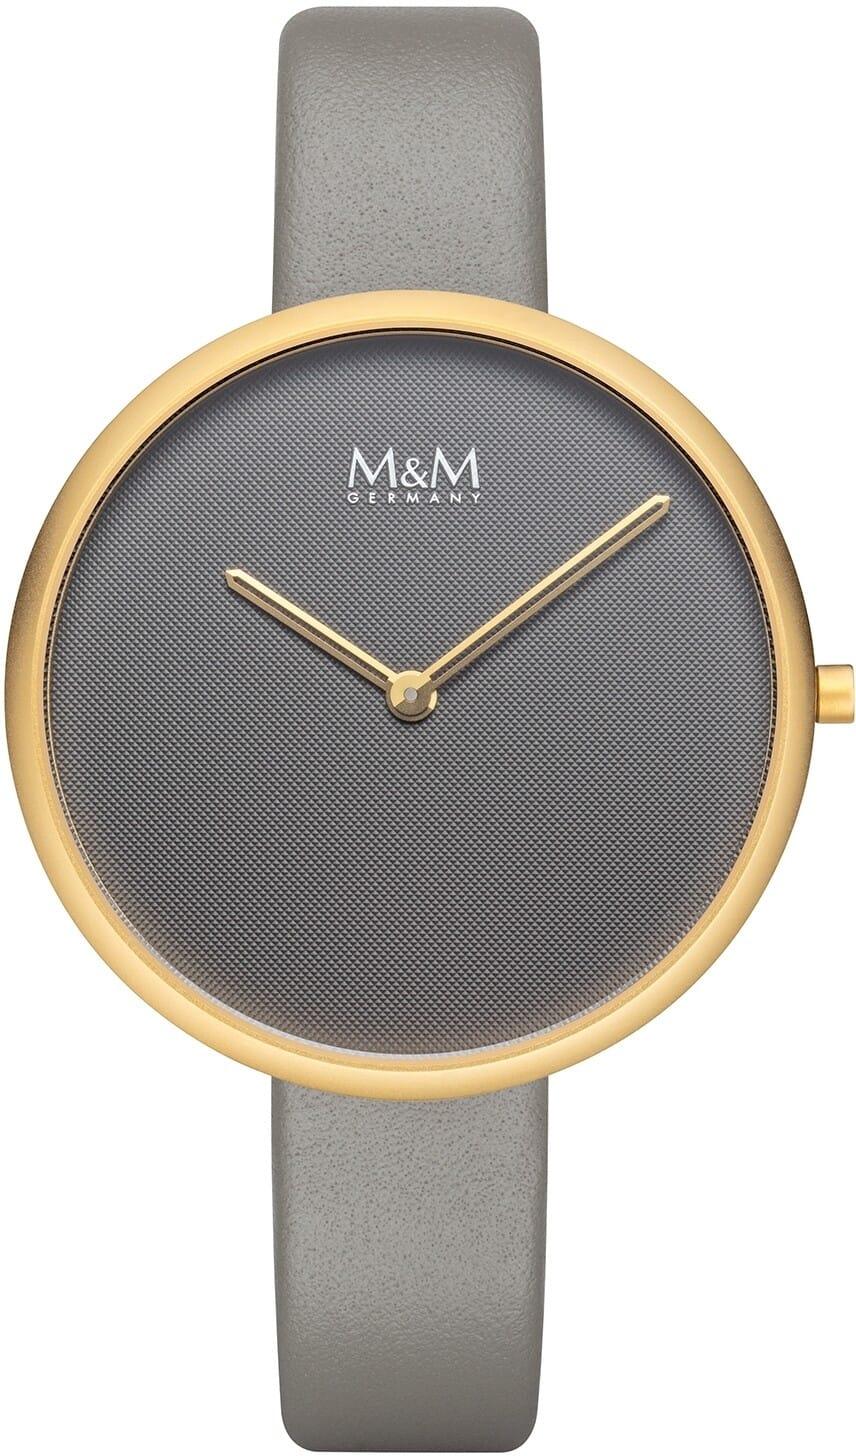 MM Germany M11954-919